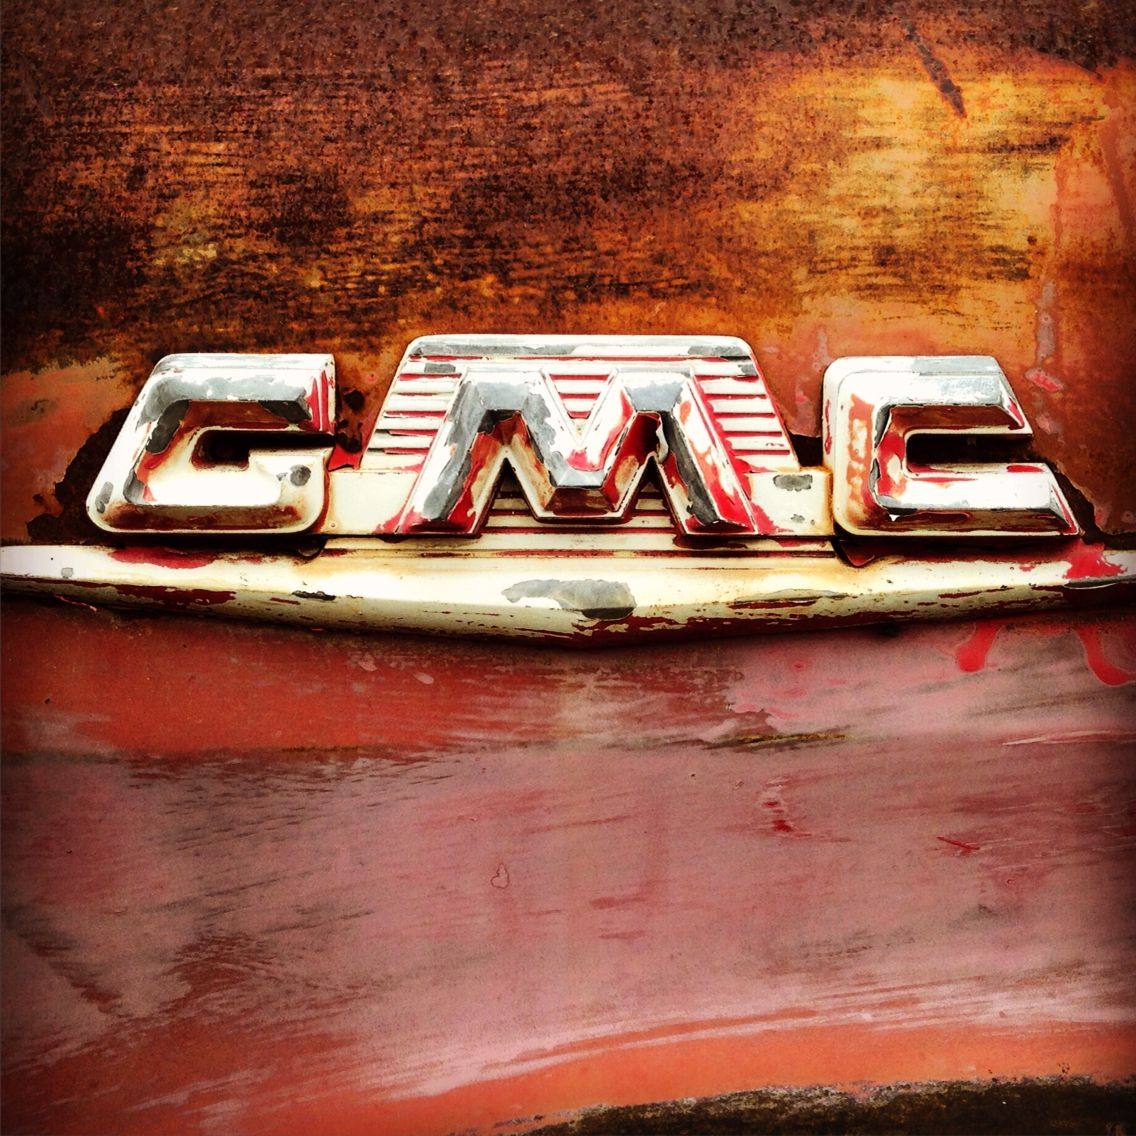 Gmc Fender Emblem On On Old Rusty Beer Truck Beer Truck